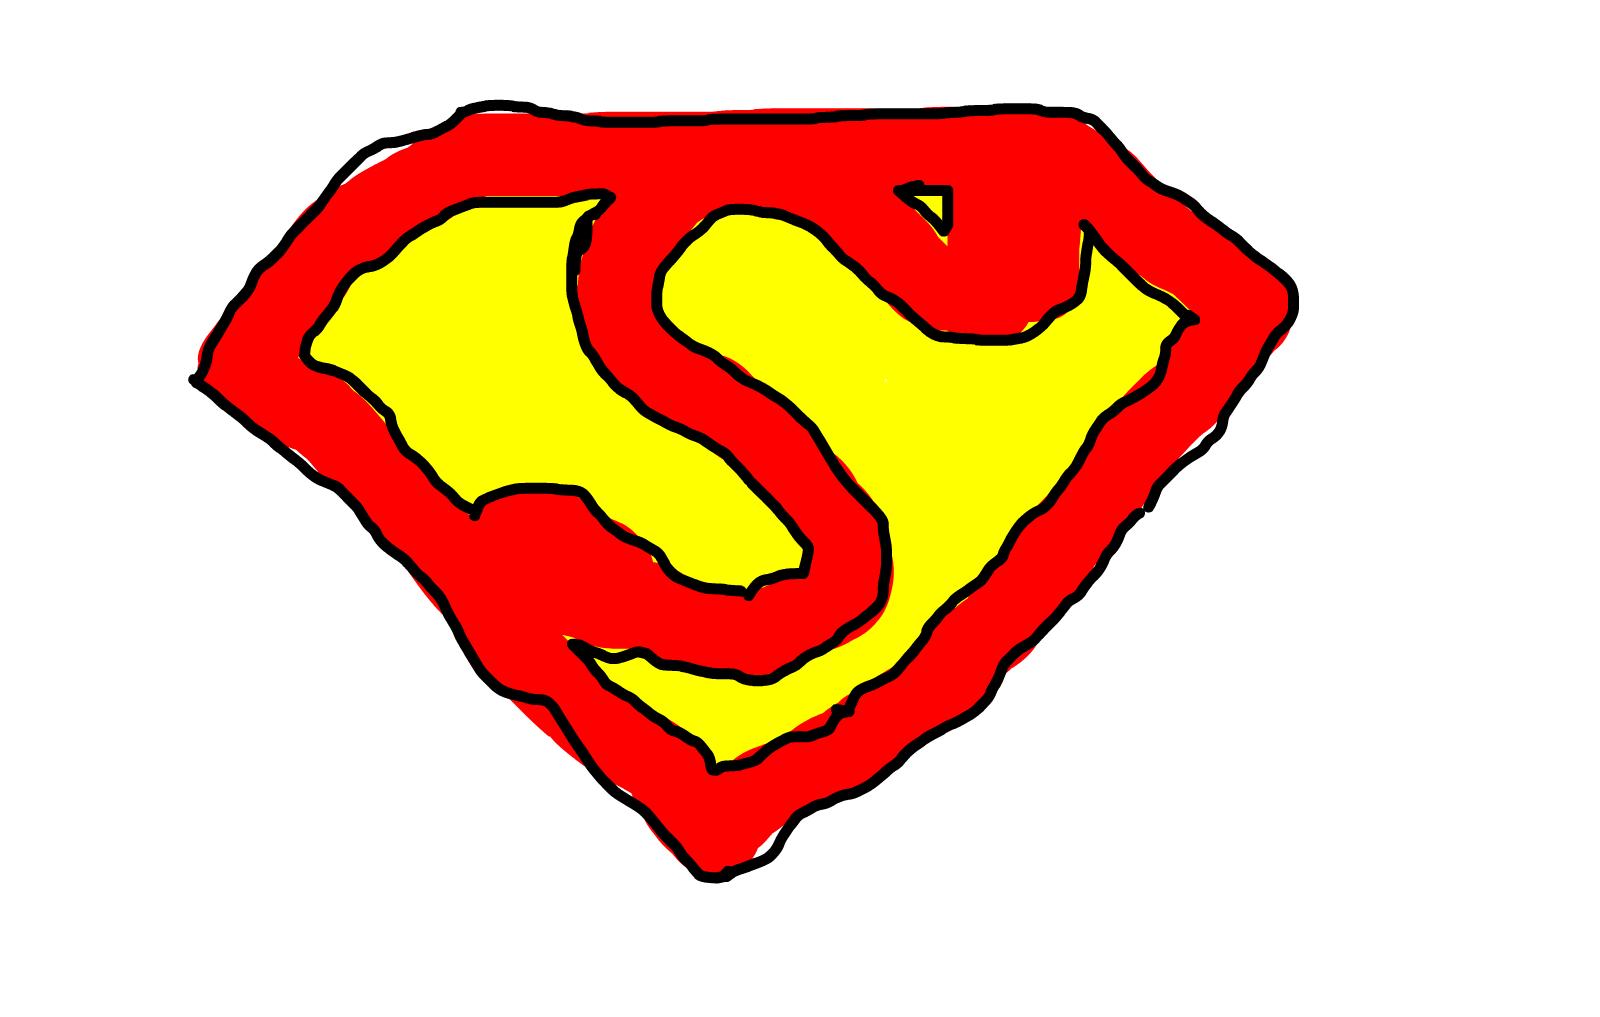 Drawn symbol superman » SketchPort Superman Superman »